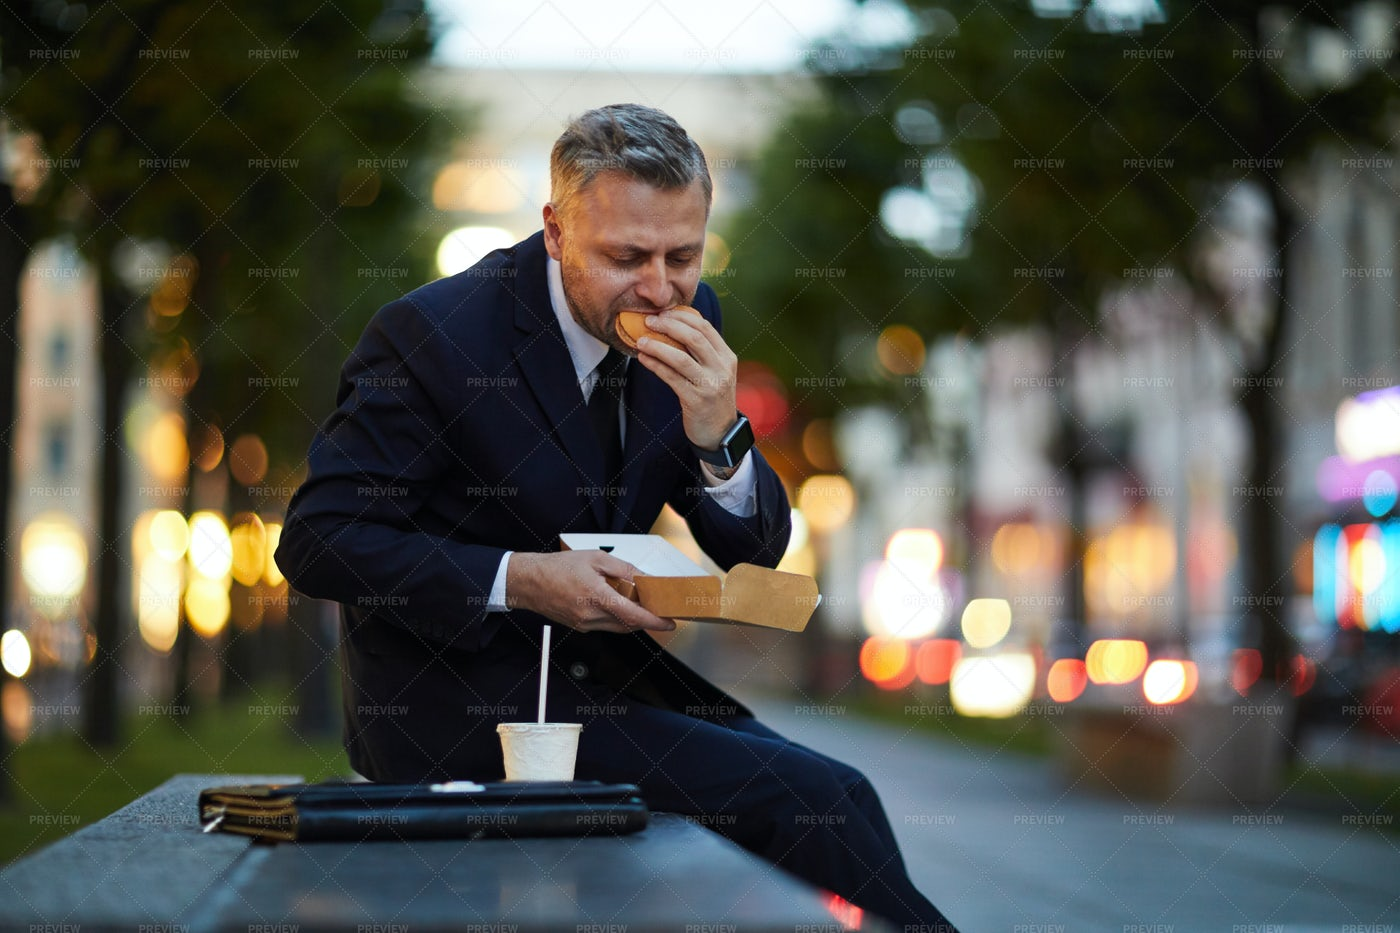 Fast Eat: Stock Photos